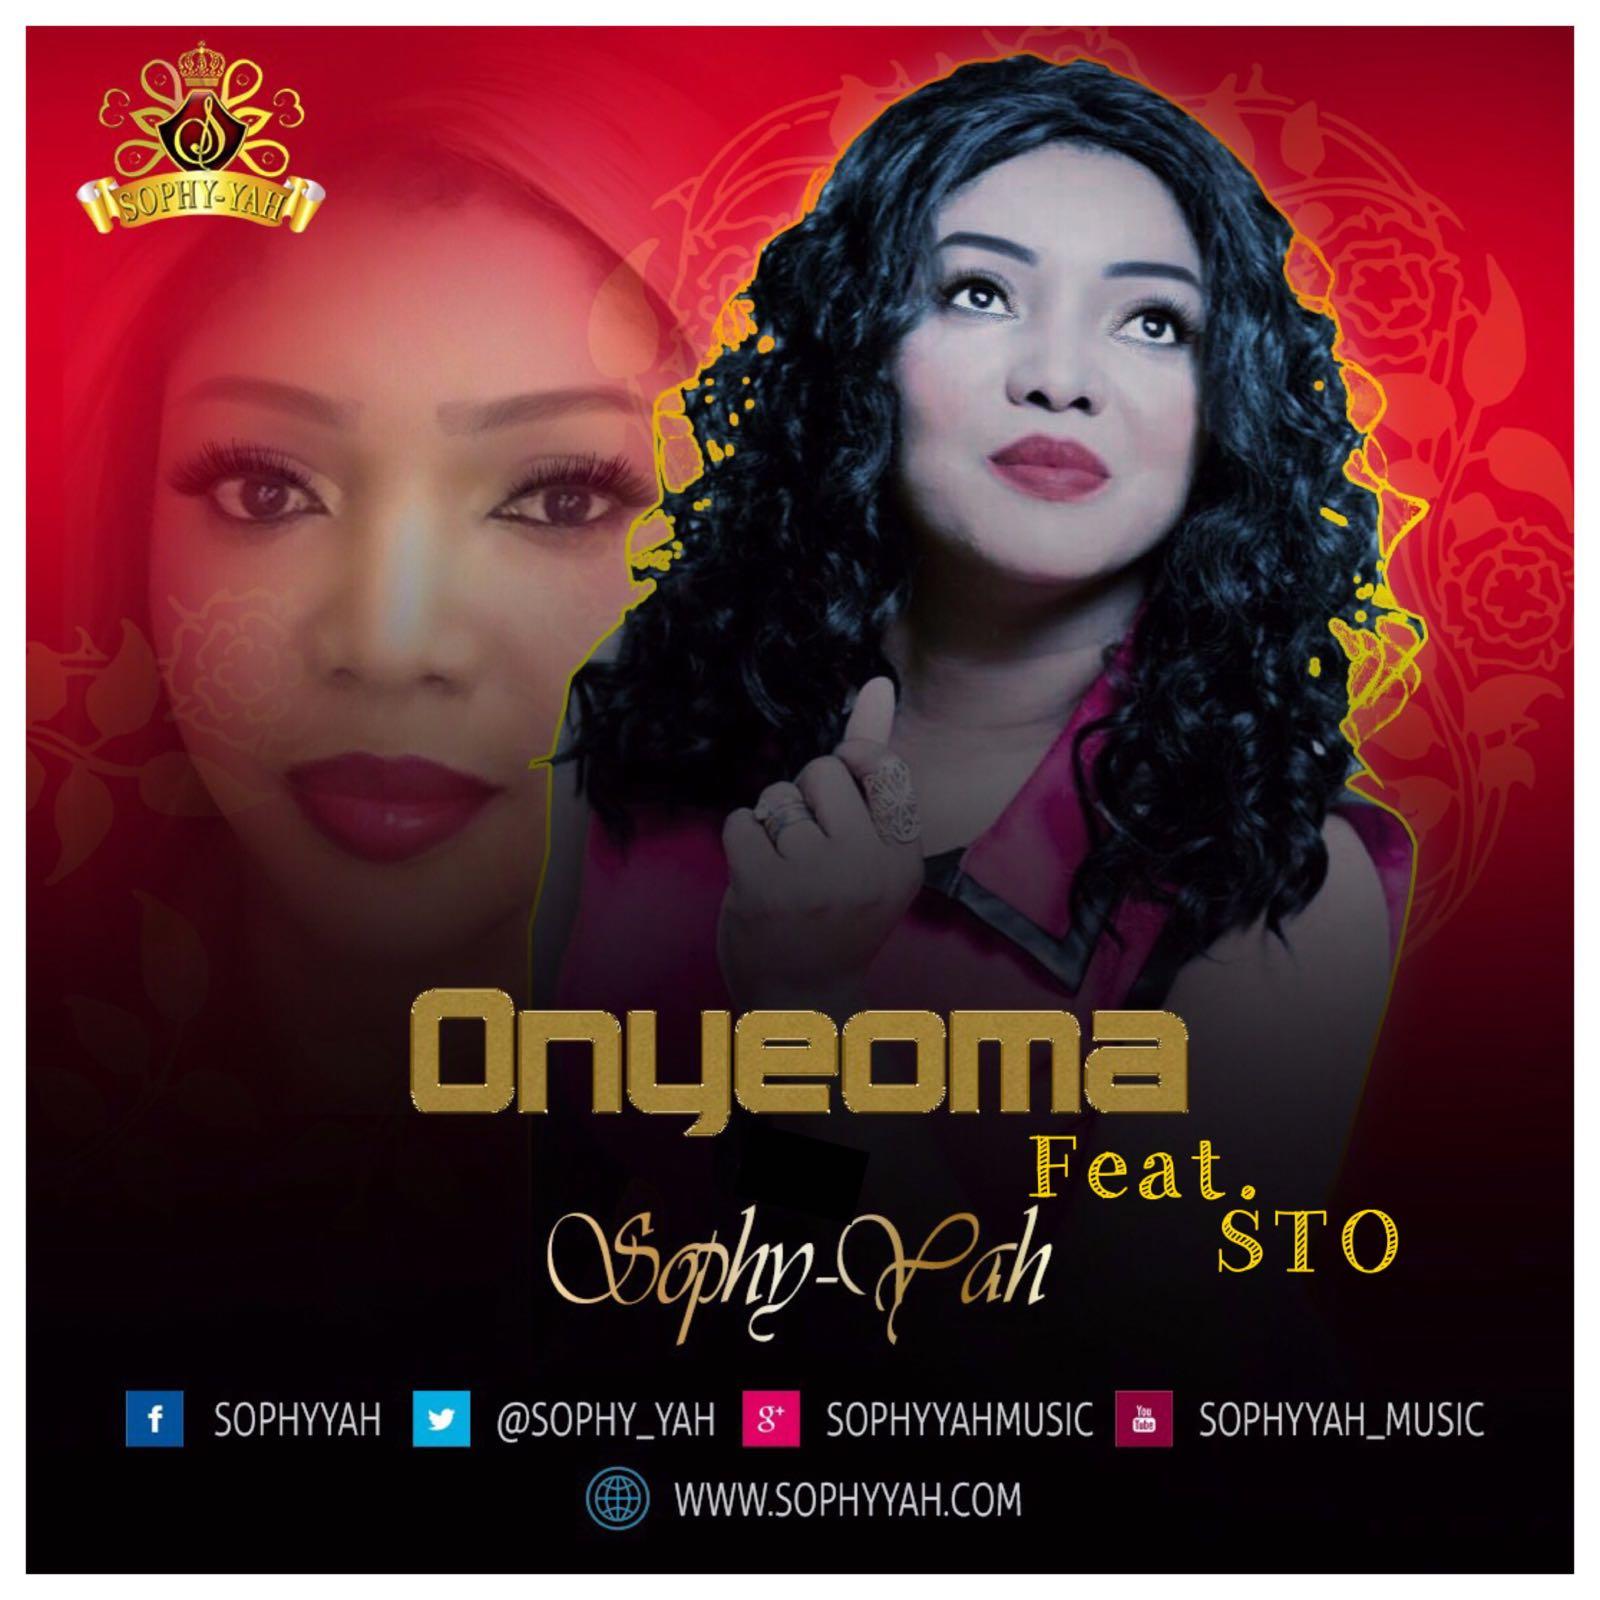 Sophy-yah - Onyeoma